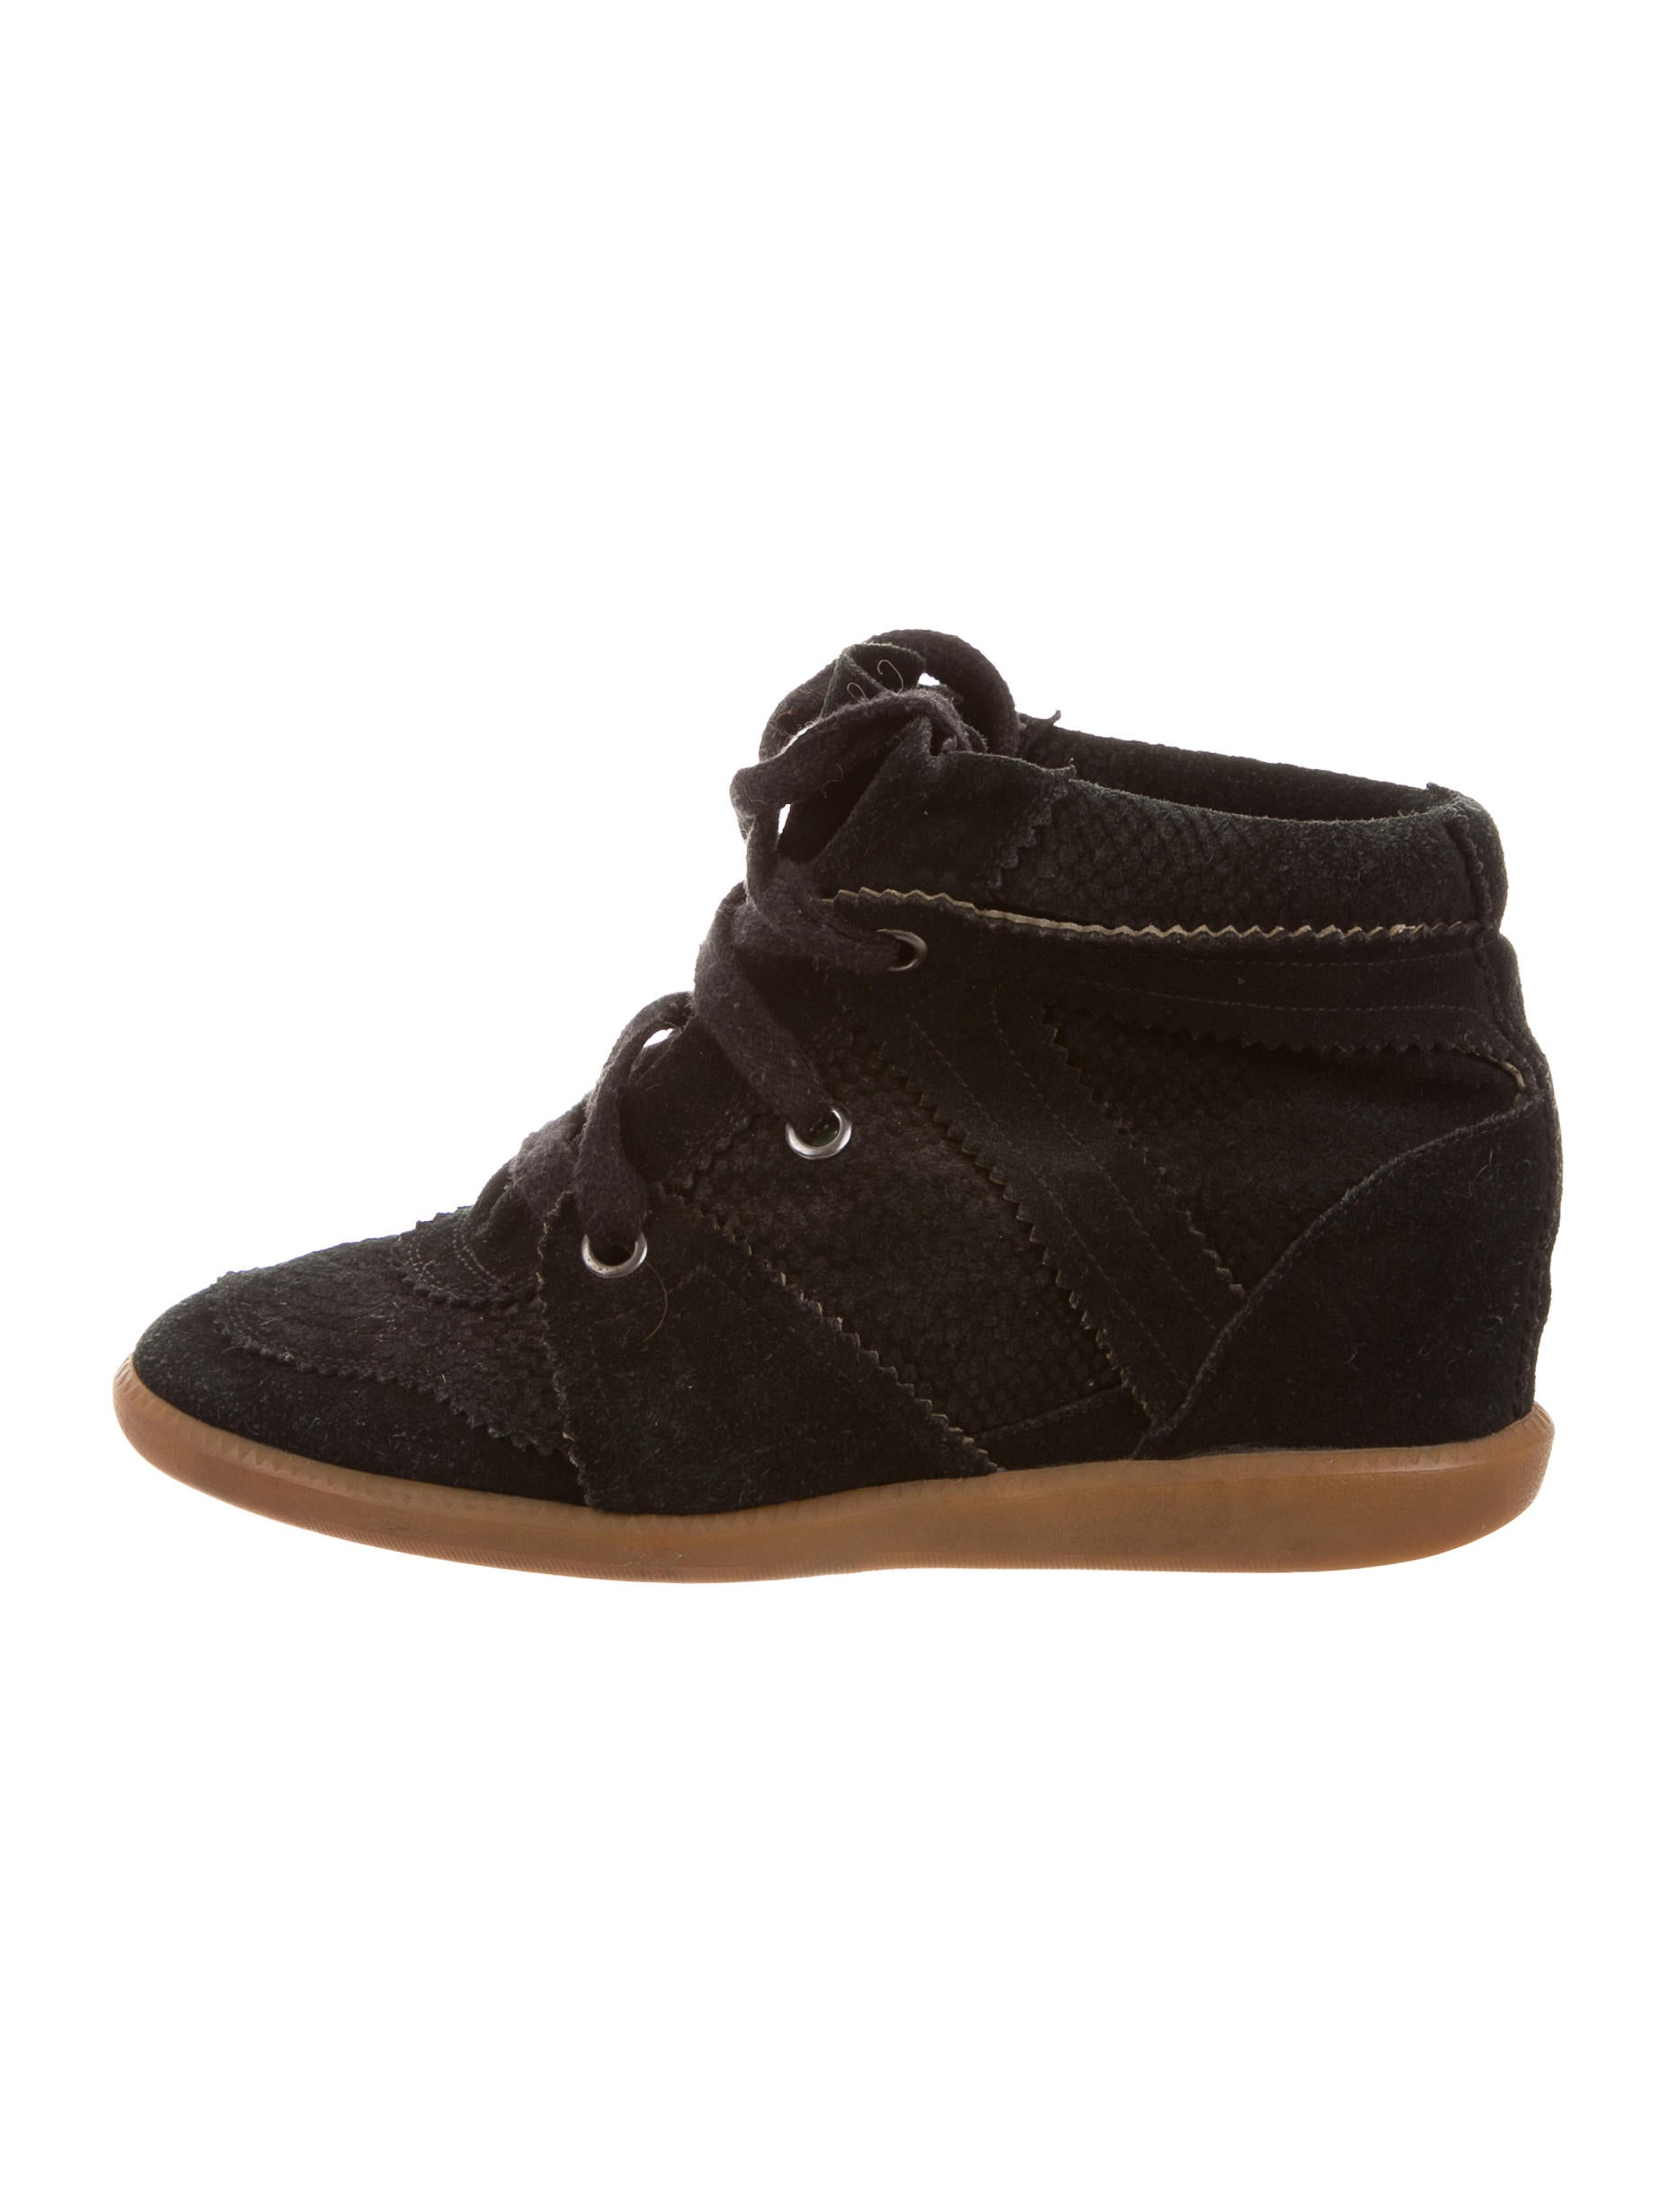 isabel marant bobby wedge sneakers shoes isa47044. Black Bedroom Furniture Sets. Home Design Ideas